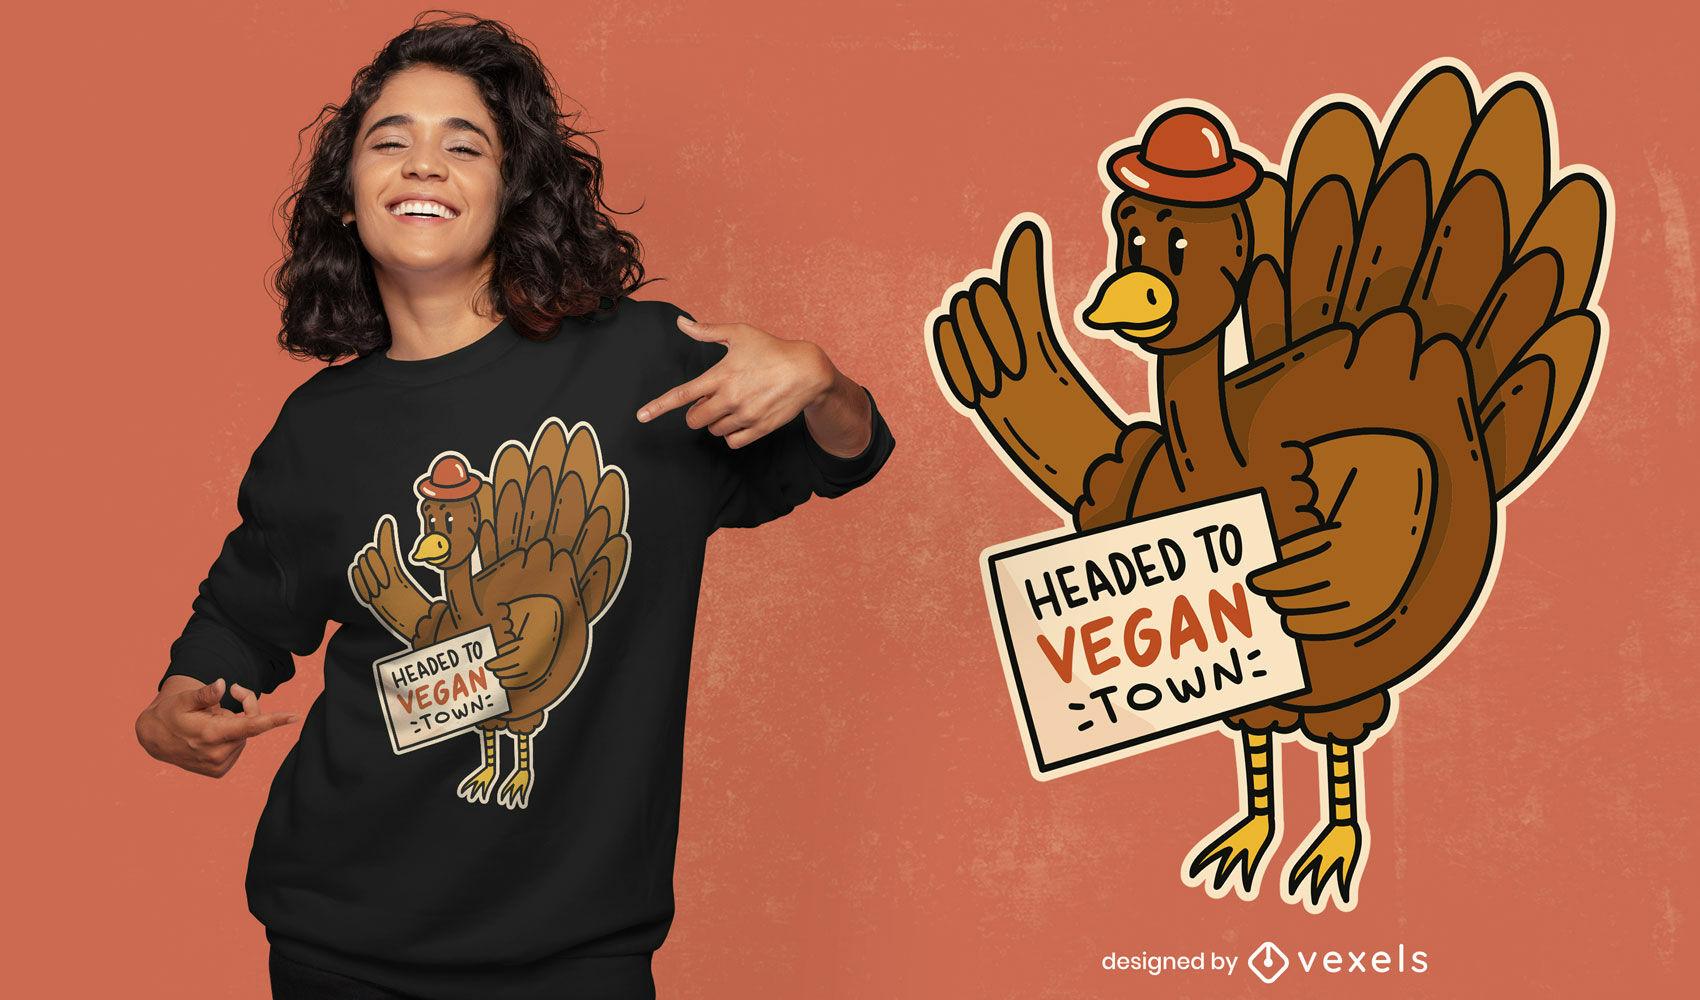 Cool vegan town turkey t-shirt design